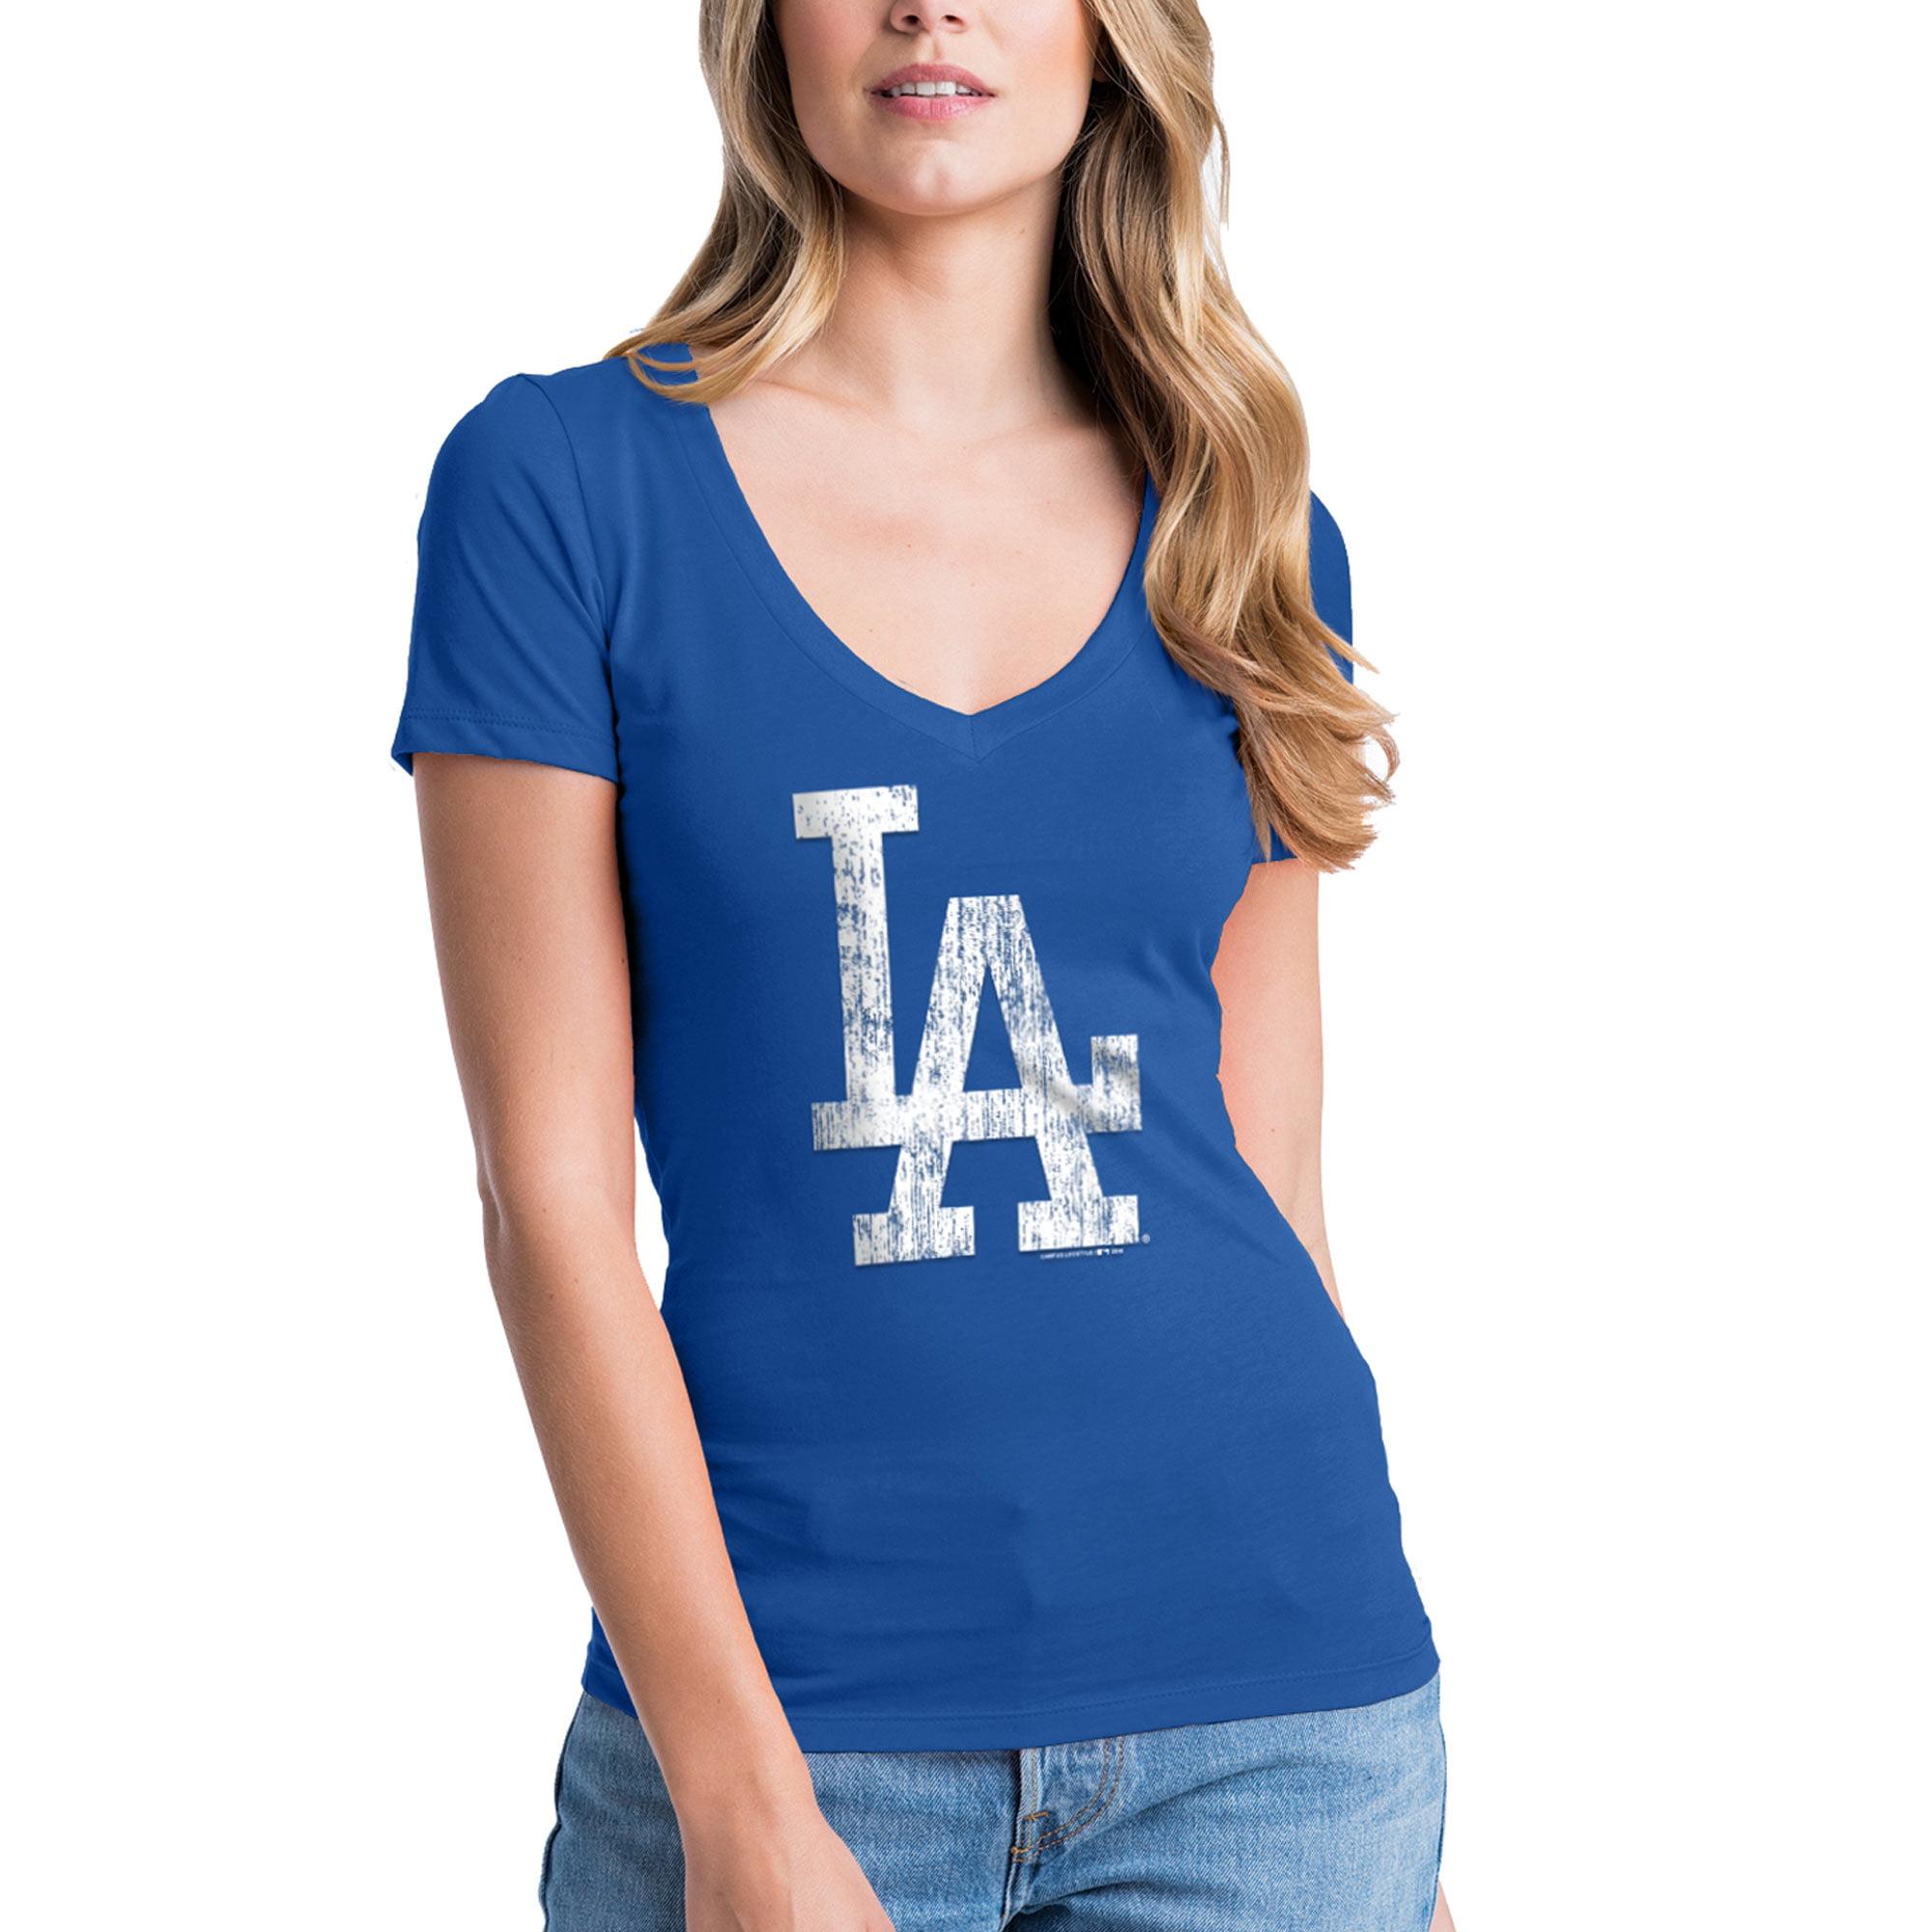 Los Angeles Dodgers New Era Women's V-Neck T-Shirt - Royal